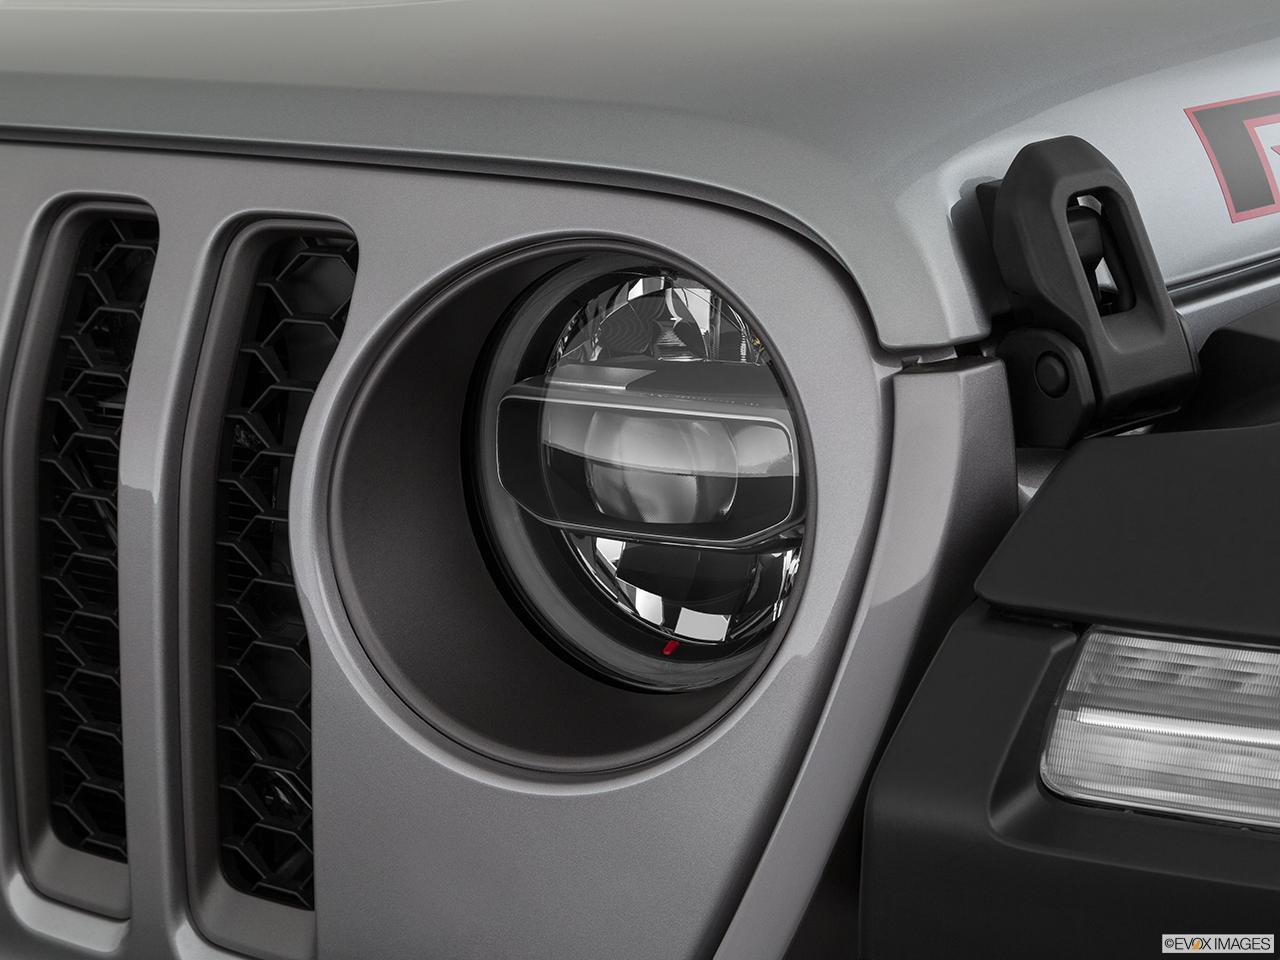 2020 Jeep Gladiator photo